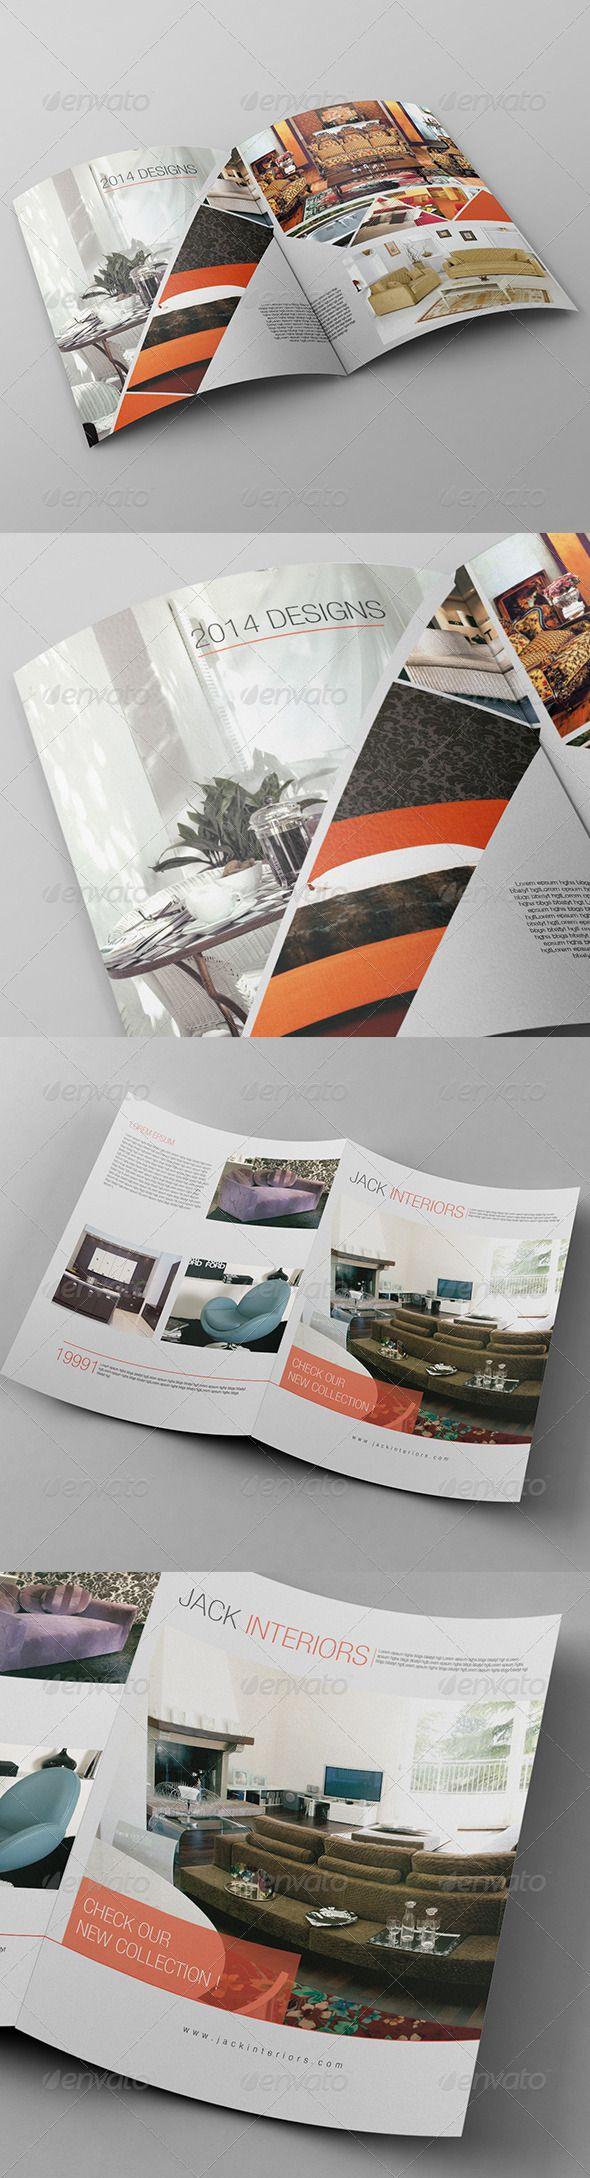 Bi-Fold Brochure Template   Adobe Photoshop, Haus Innenräume und ...